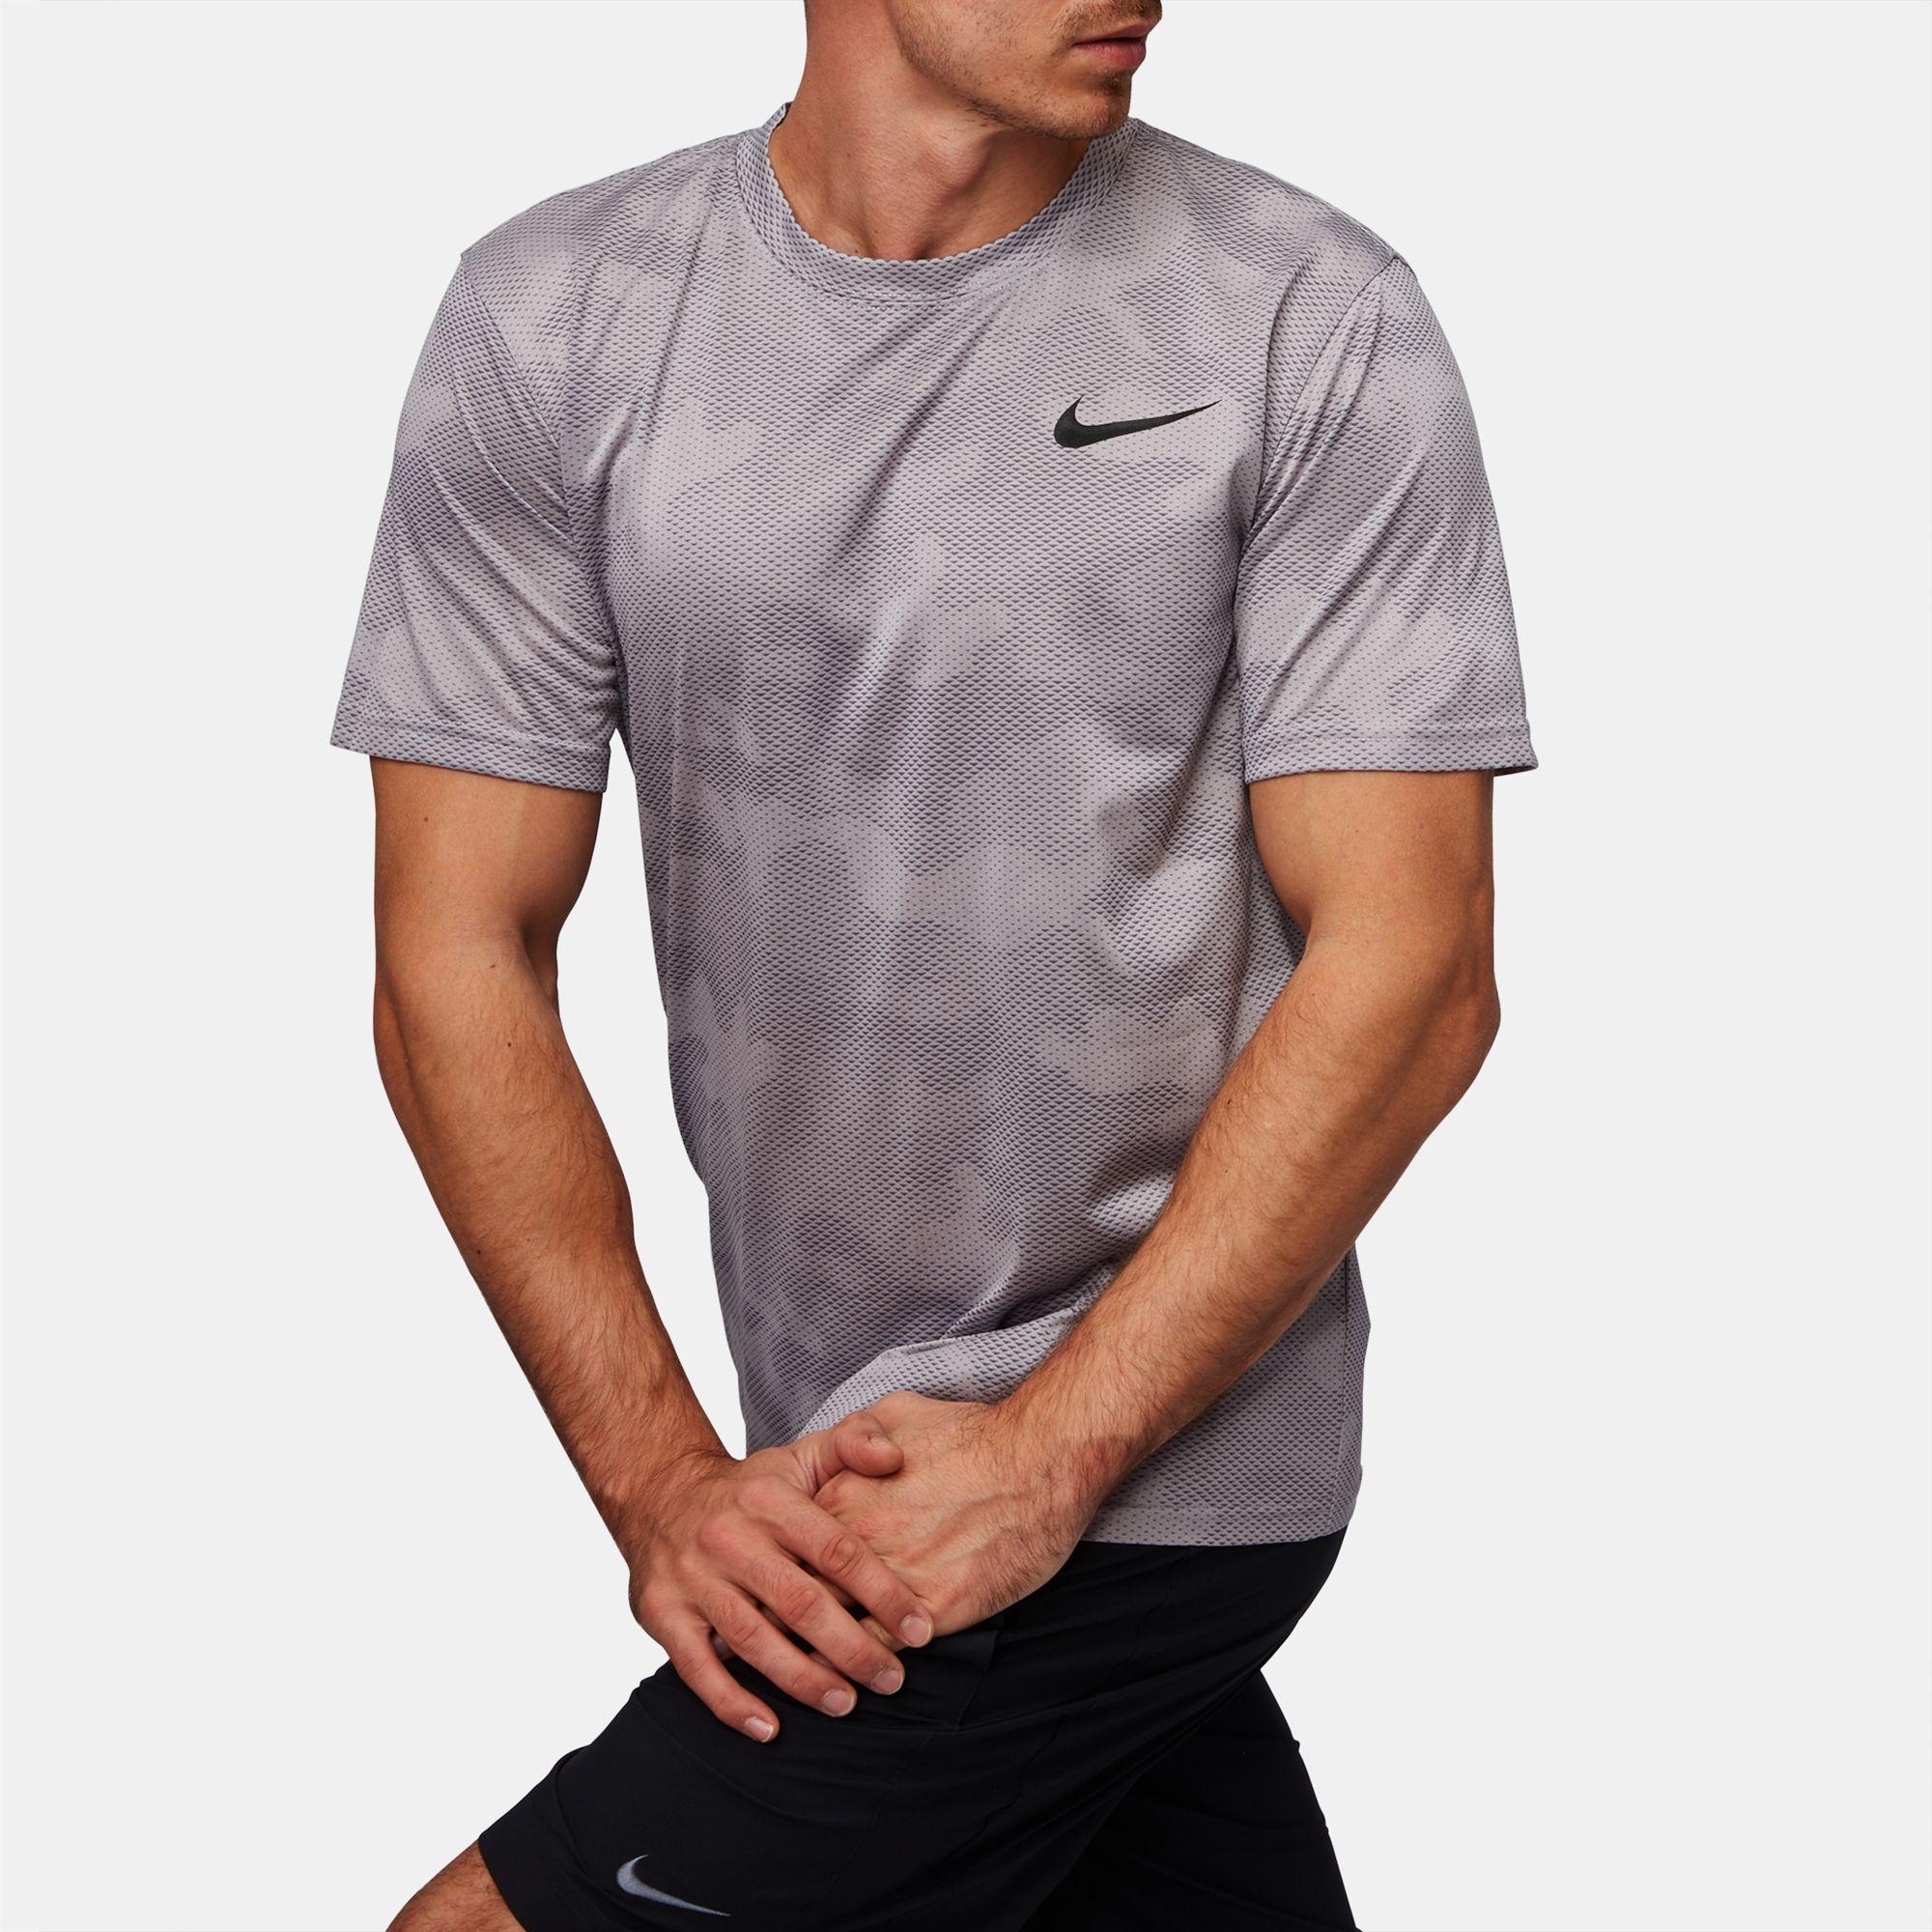 70df9094af48 Shop Grey Nike Dry Legend Camo Training T Shirt for Mens by Nike 1